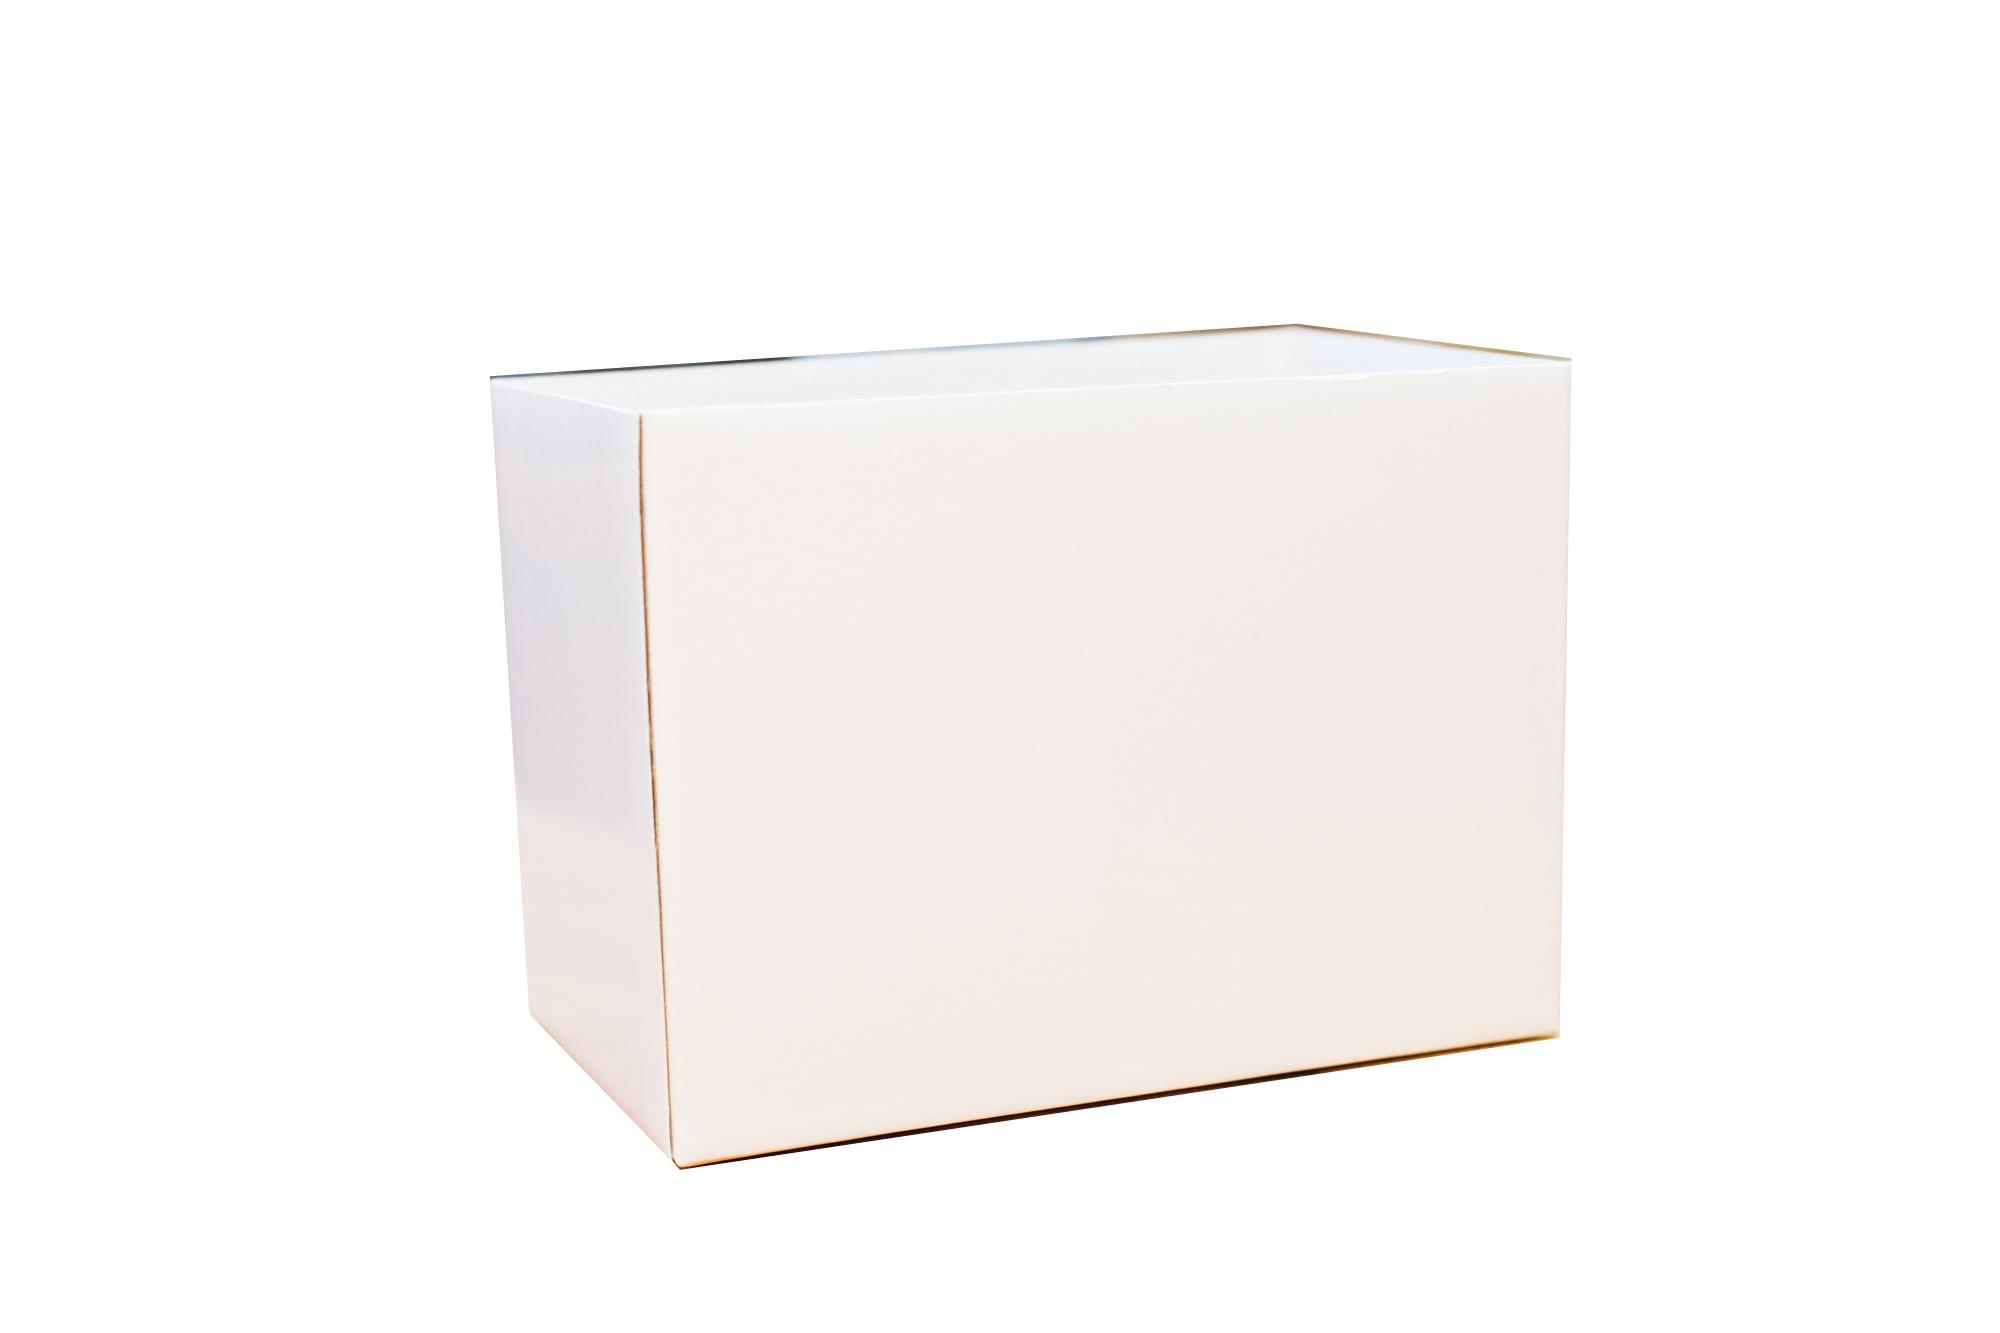 Fresh Cookie Gift Box